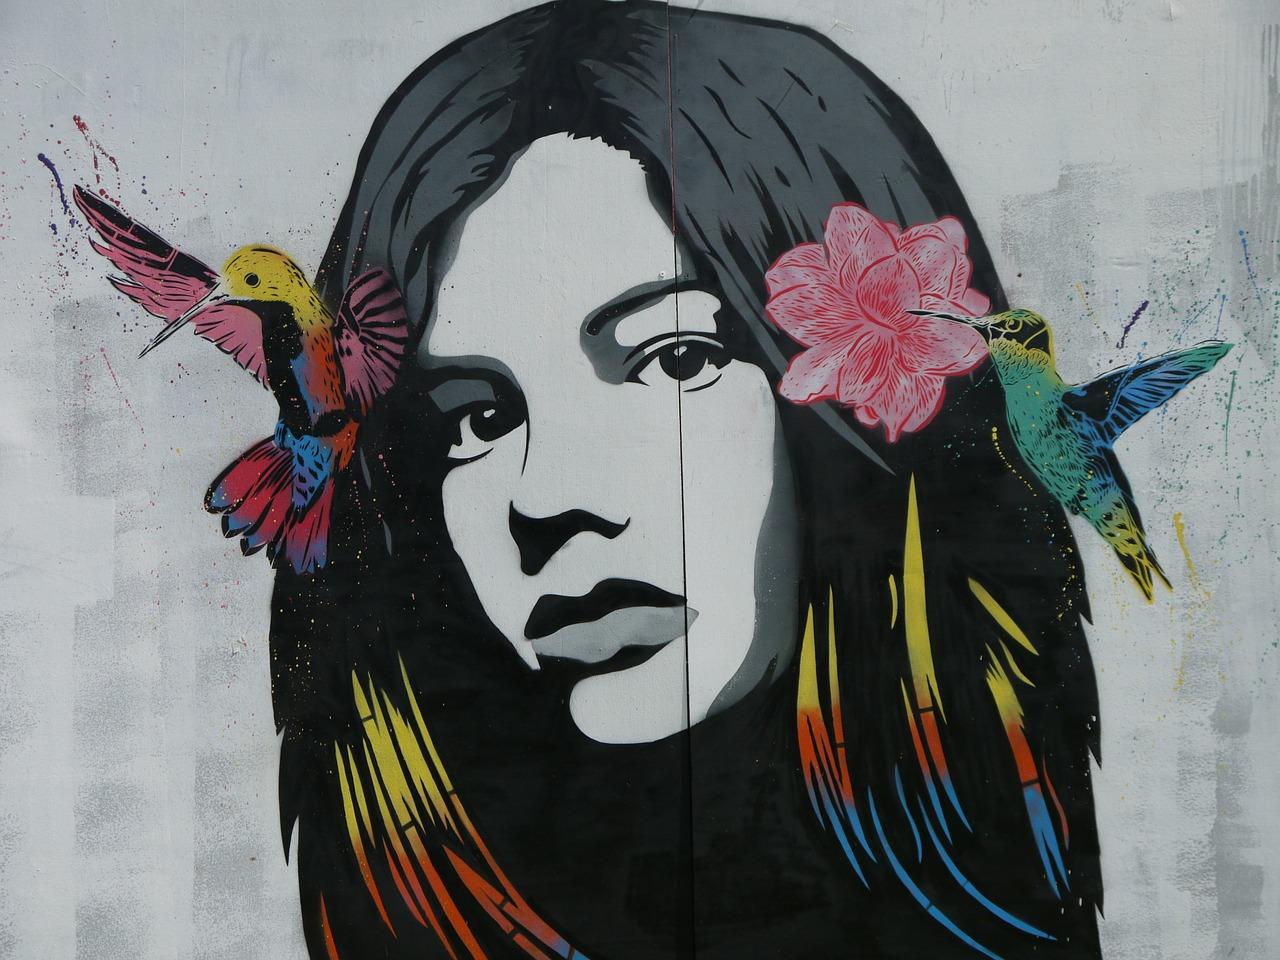 street-art-465304_1280